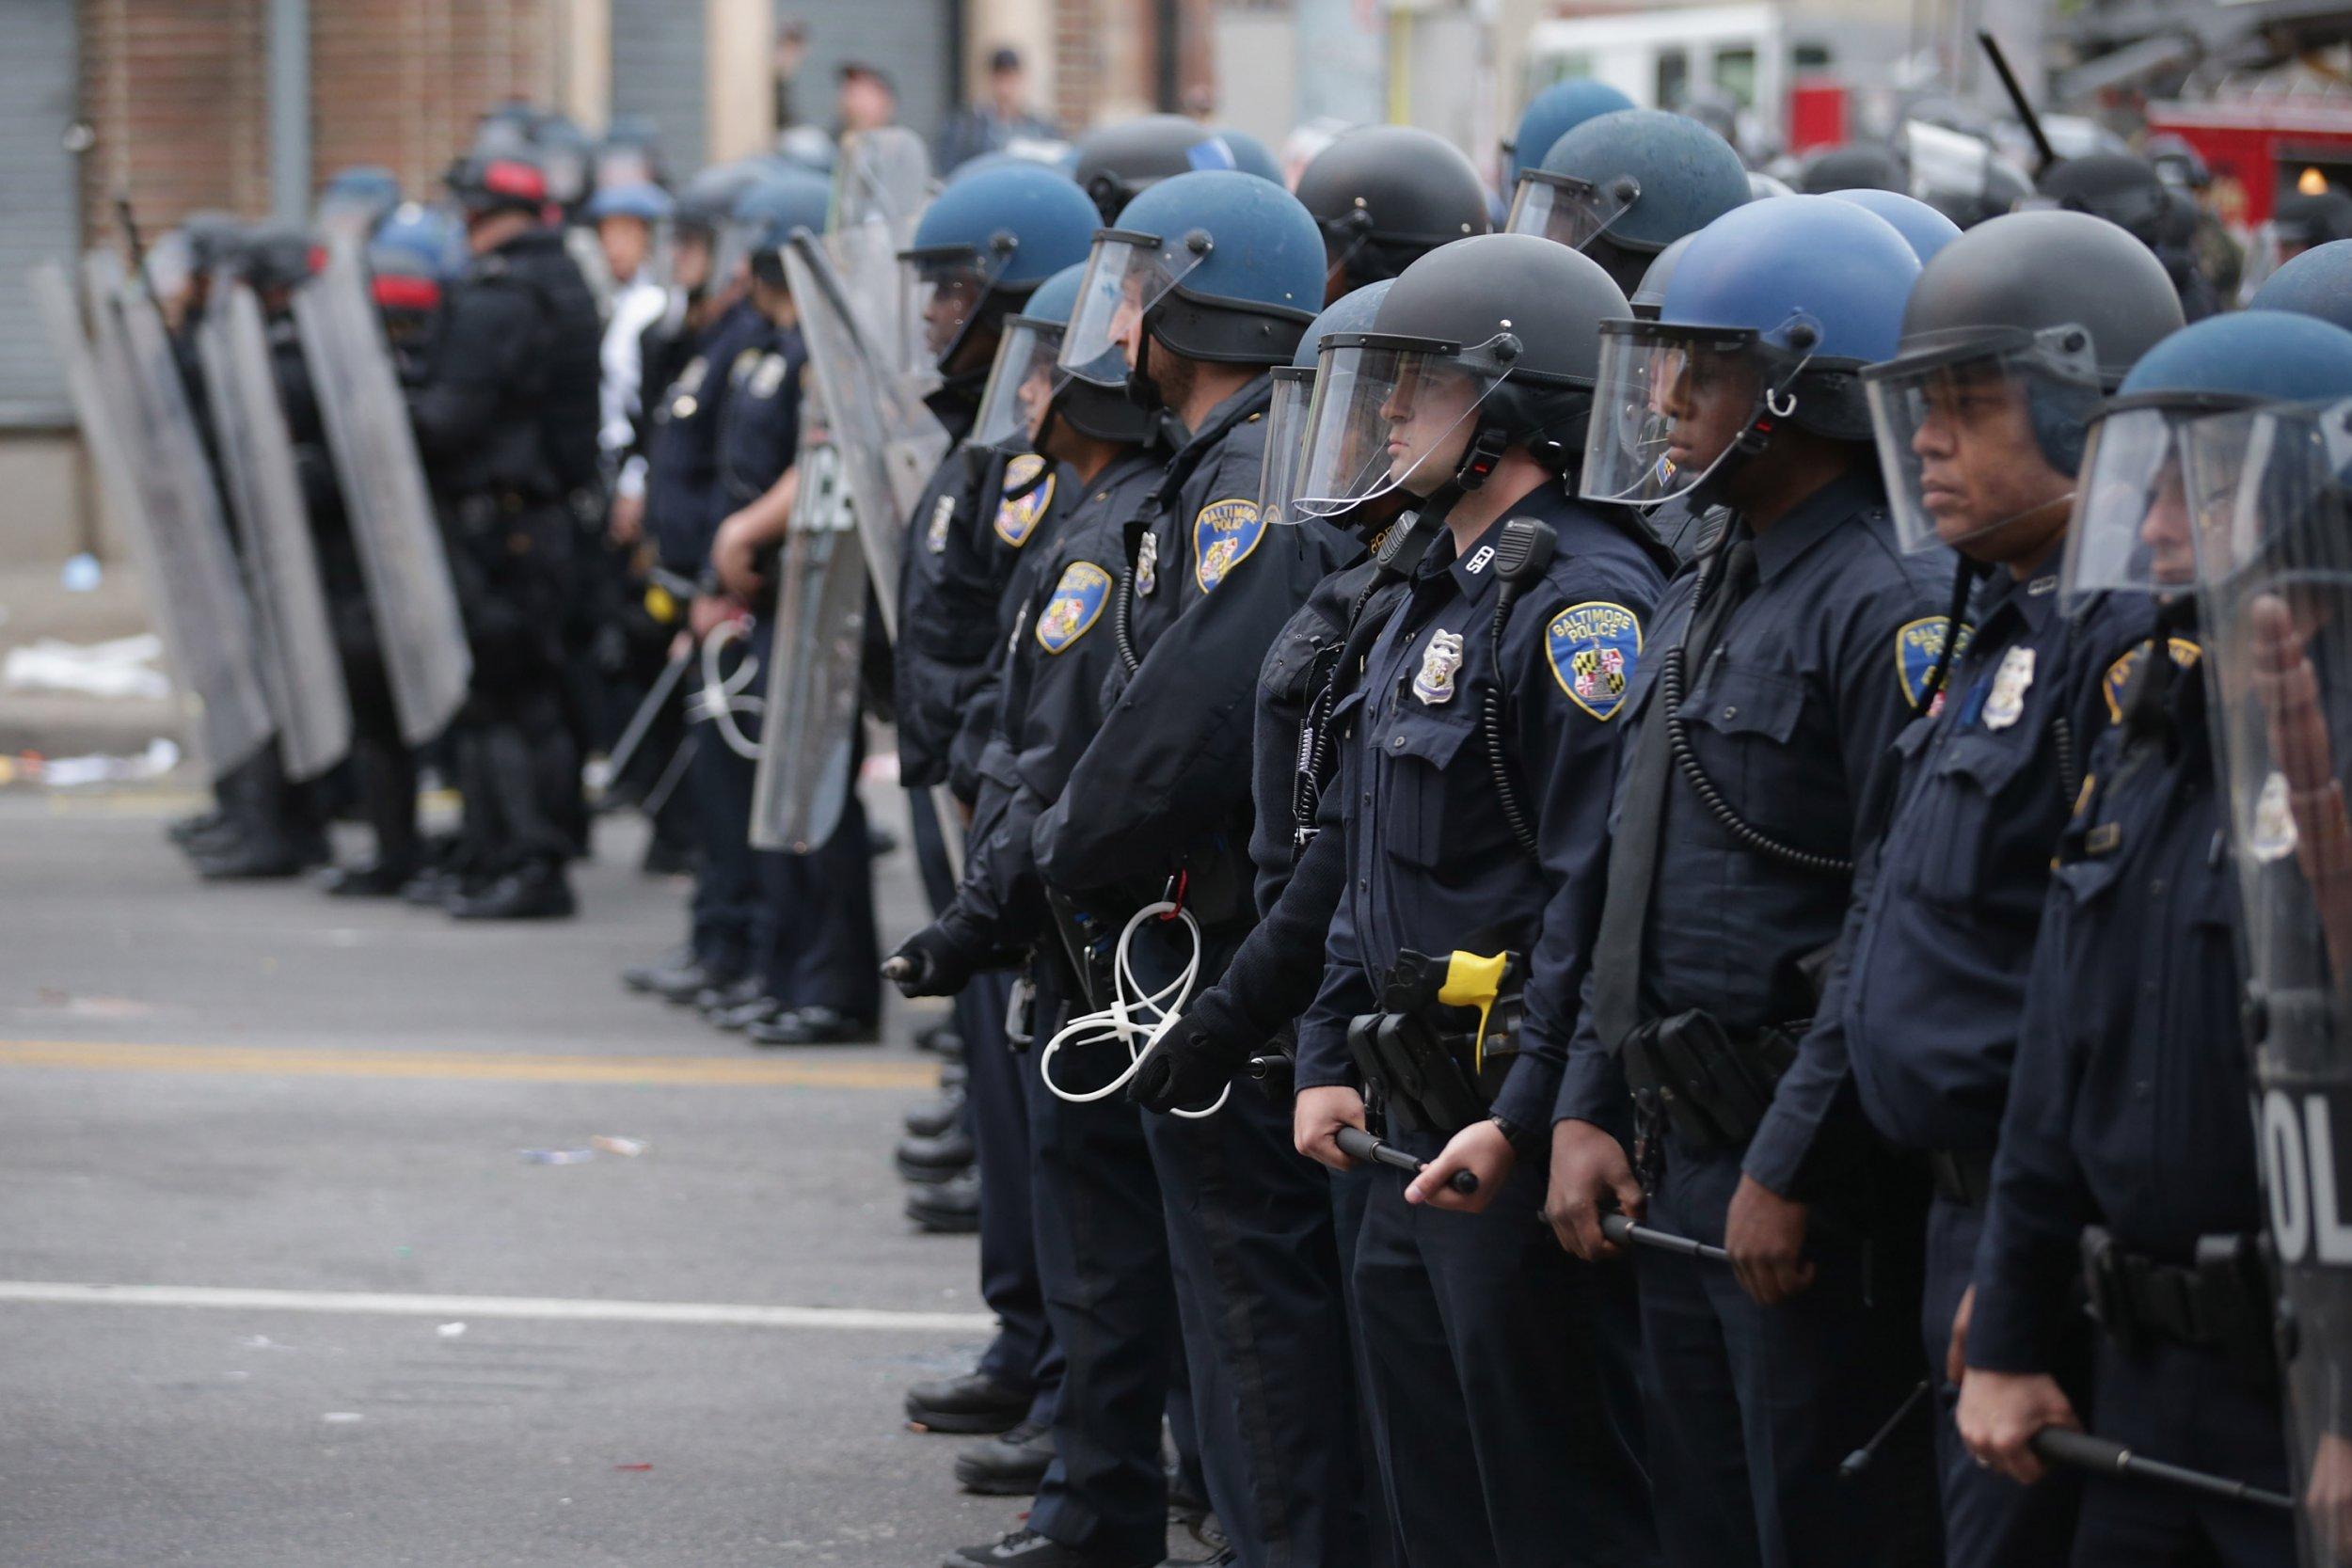 12_22_Police freddie gray